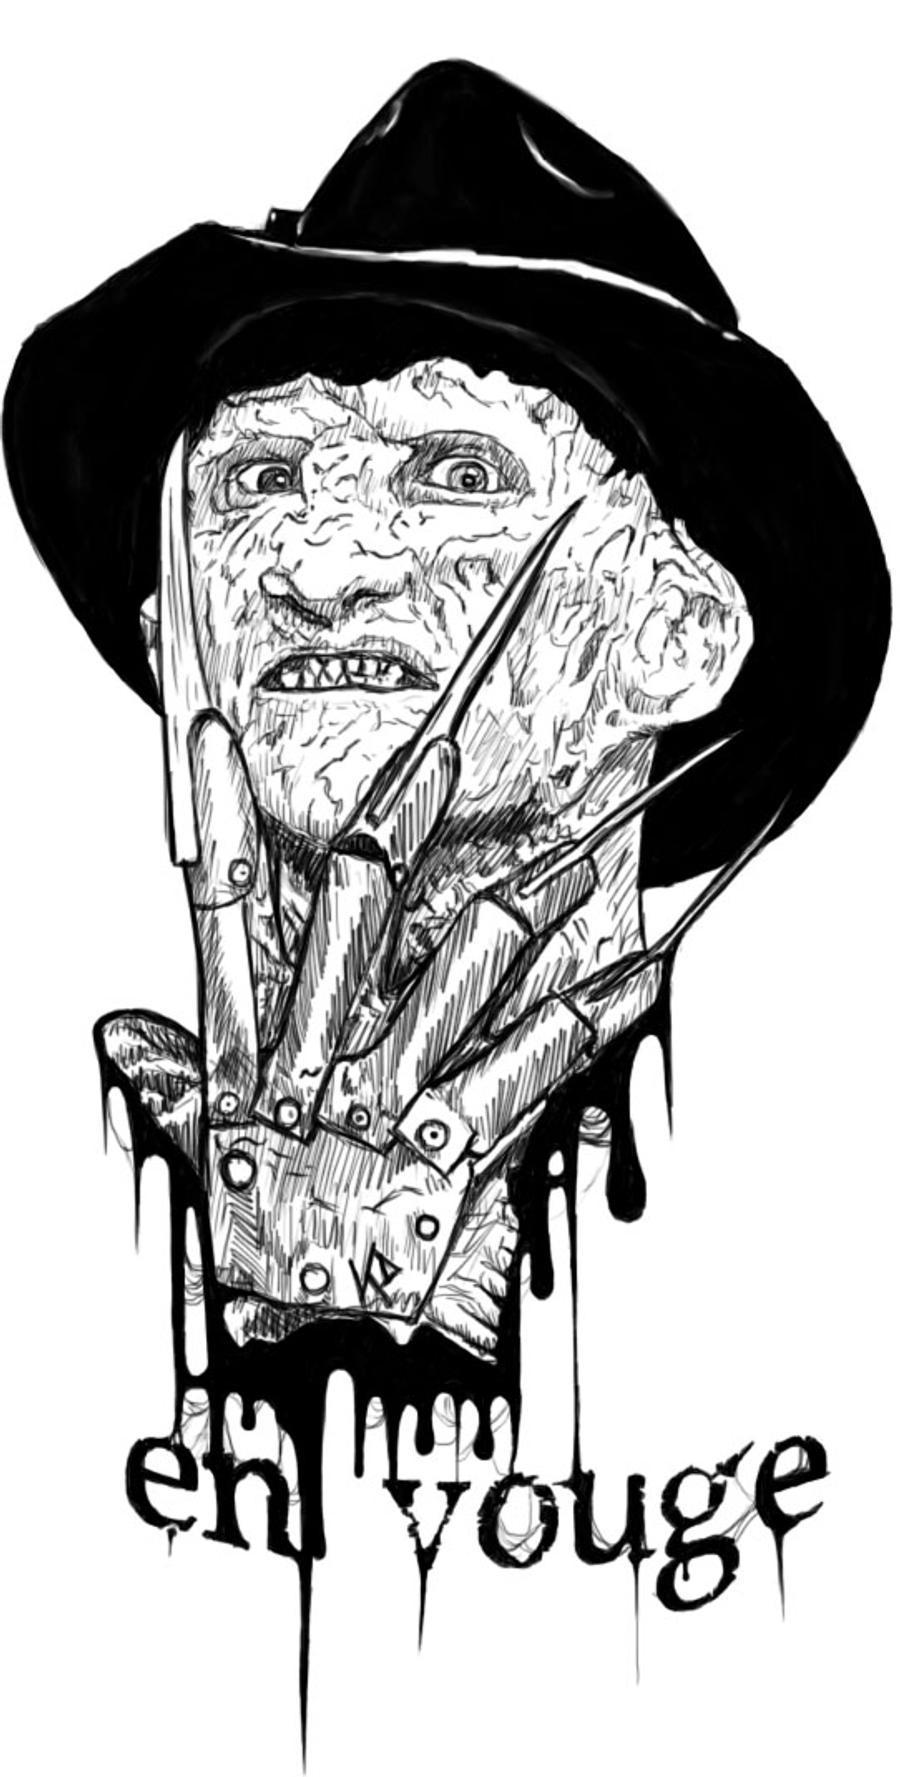 Freddy Krueger By Manipulatedlife On Deviantart